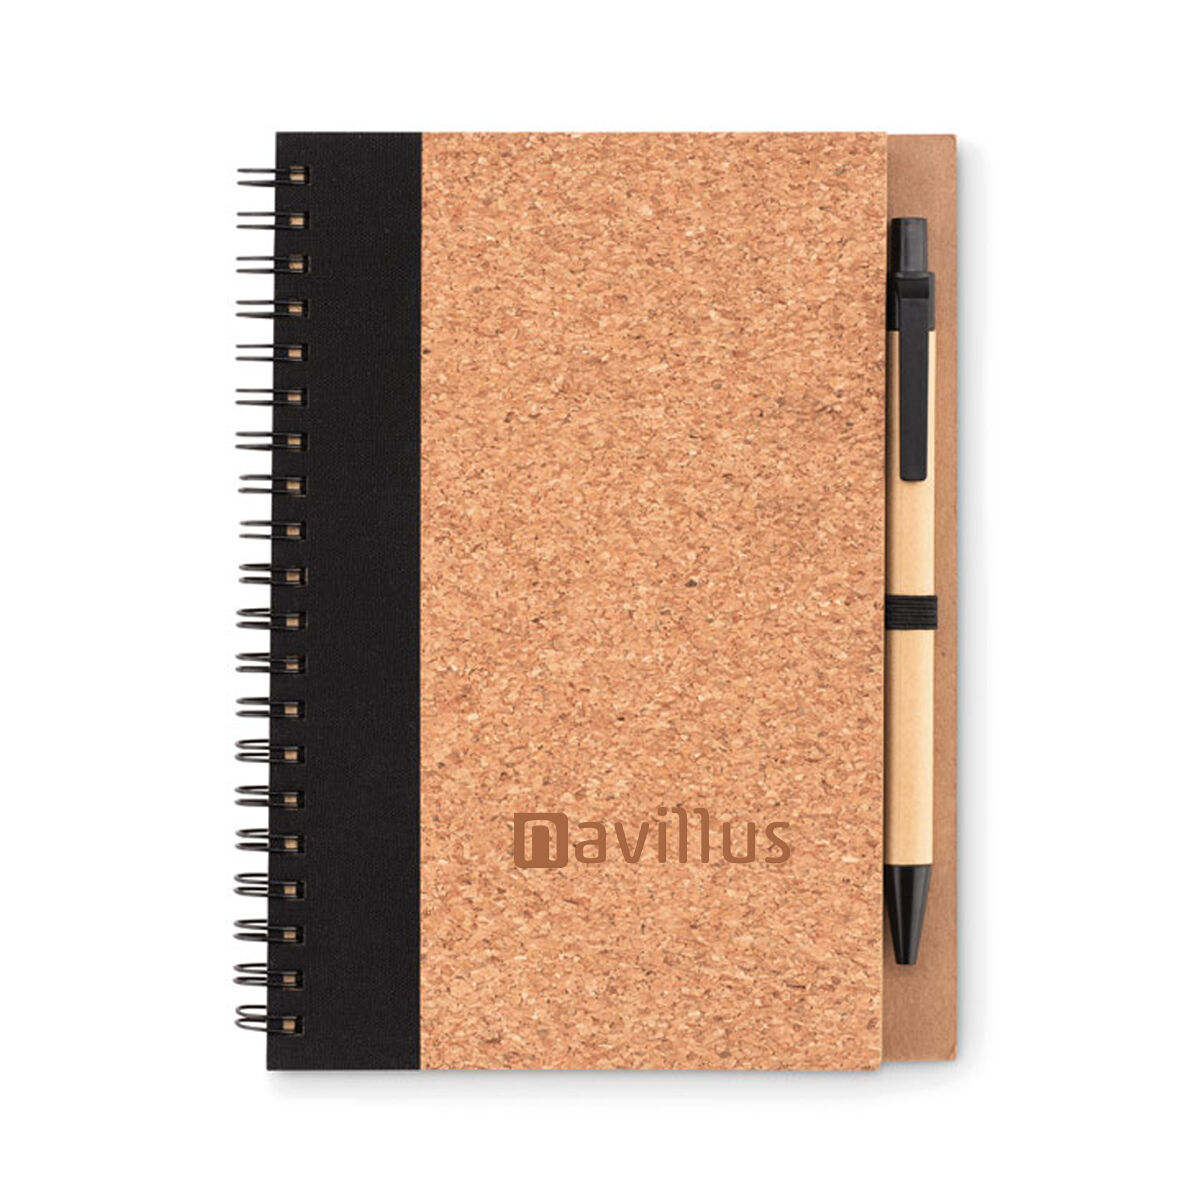 Cork Cover Notebook & Pen